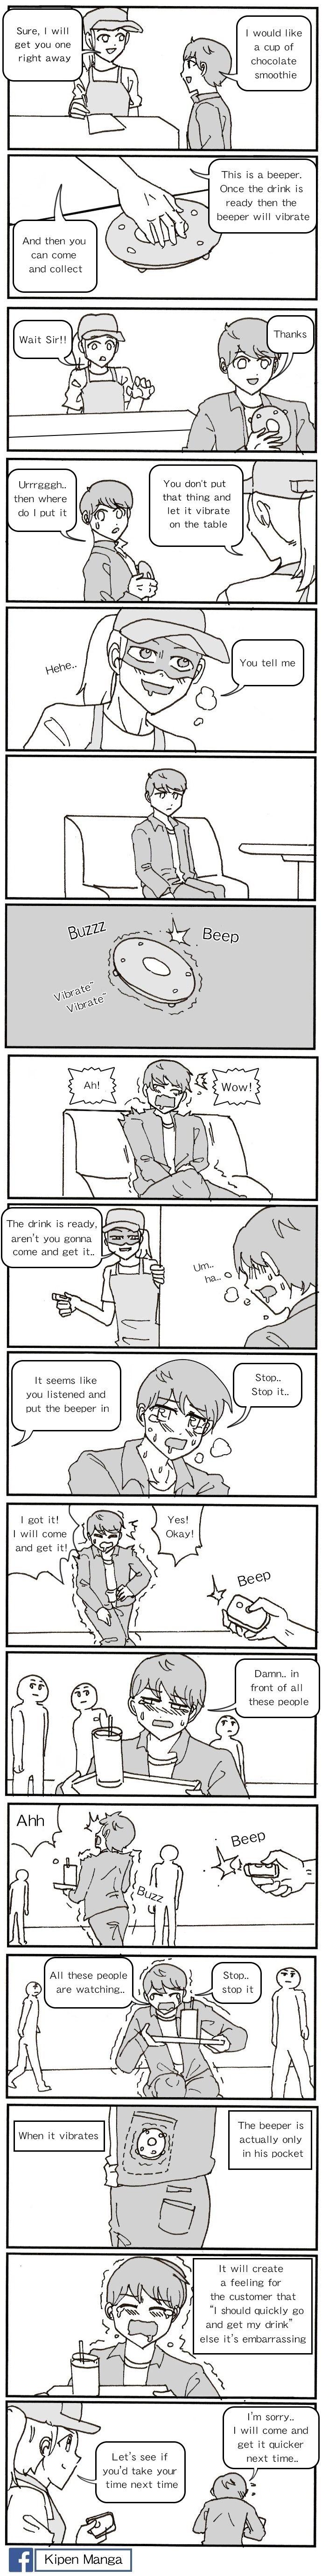 Kipen Manga - Drink